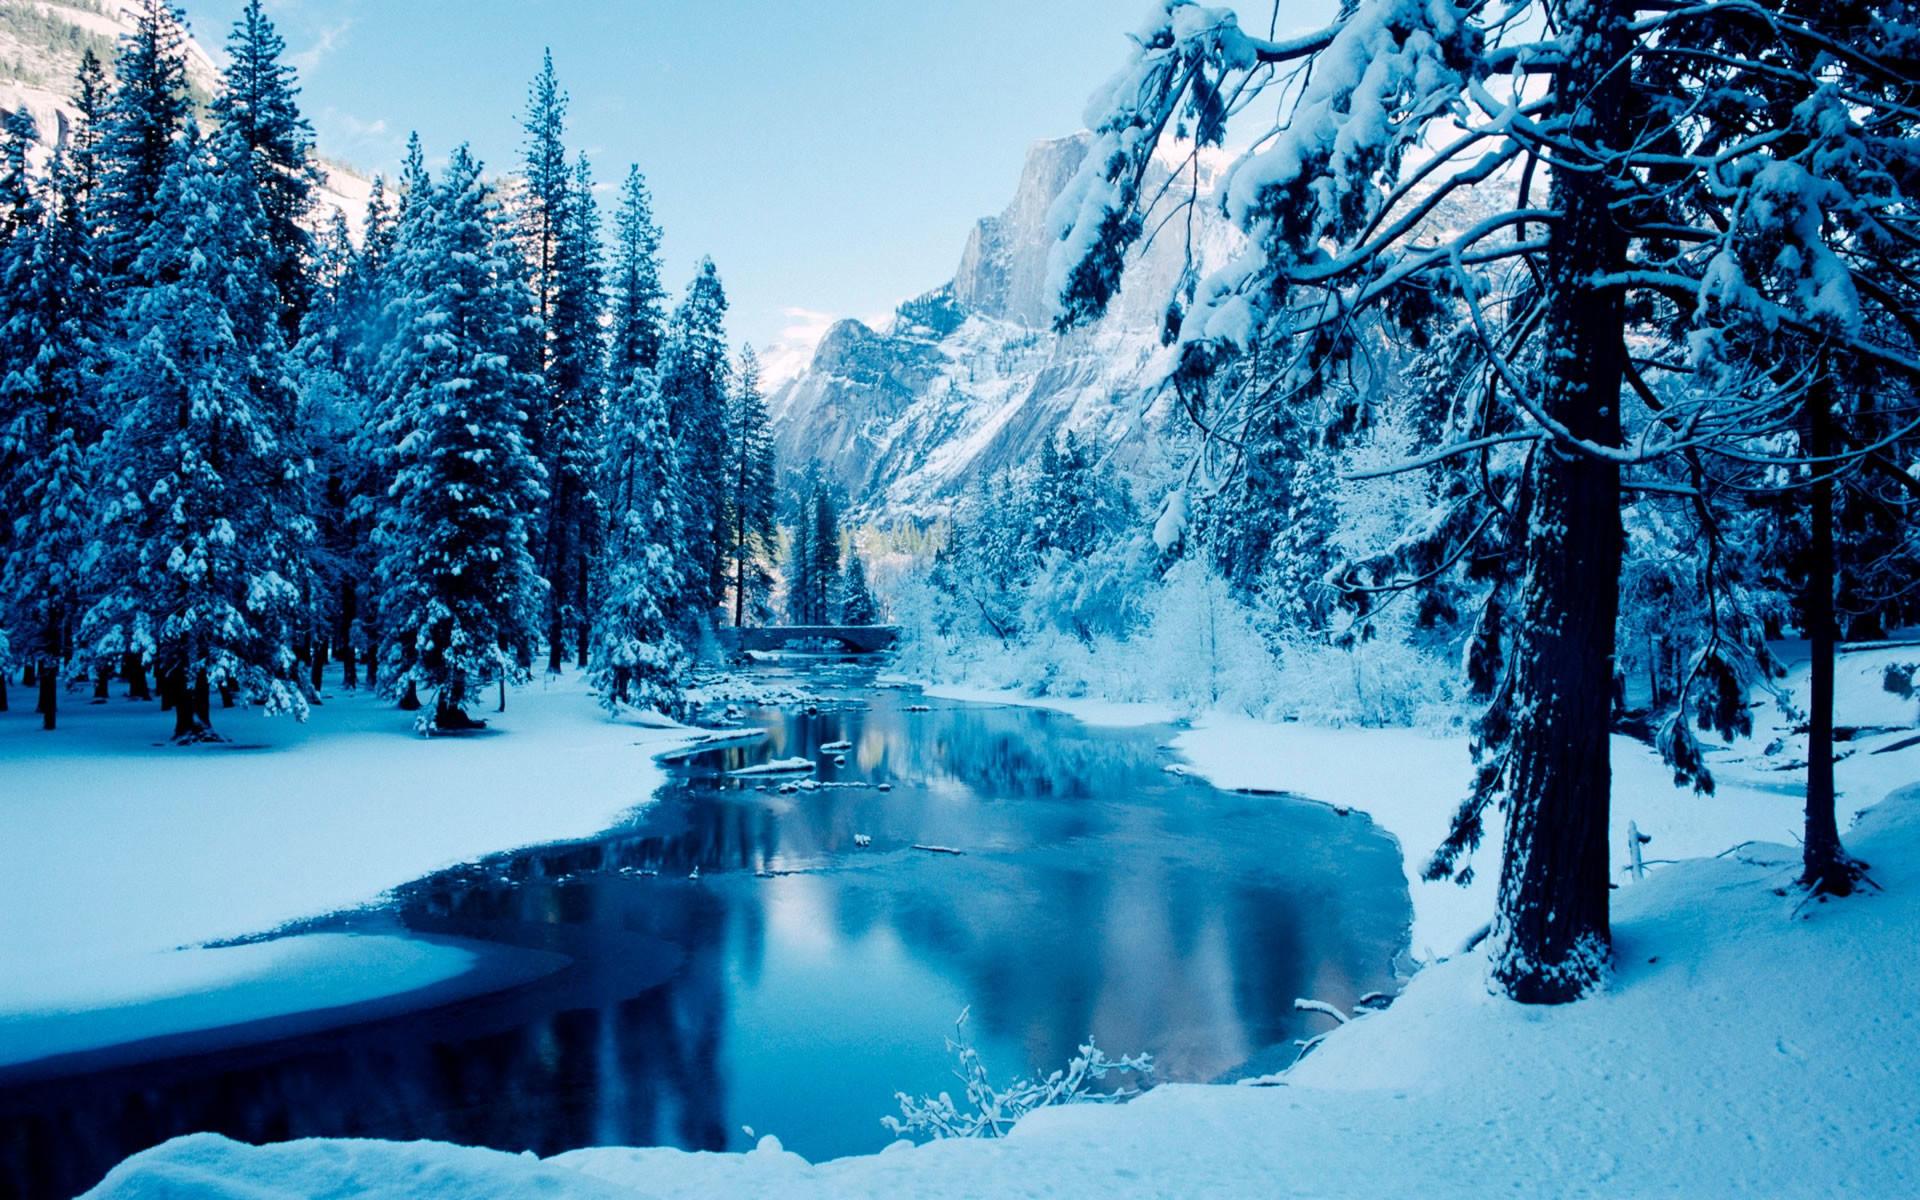 Winter Wallpaper 12